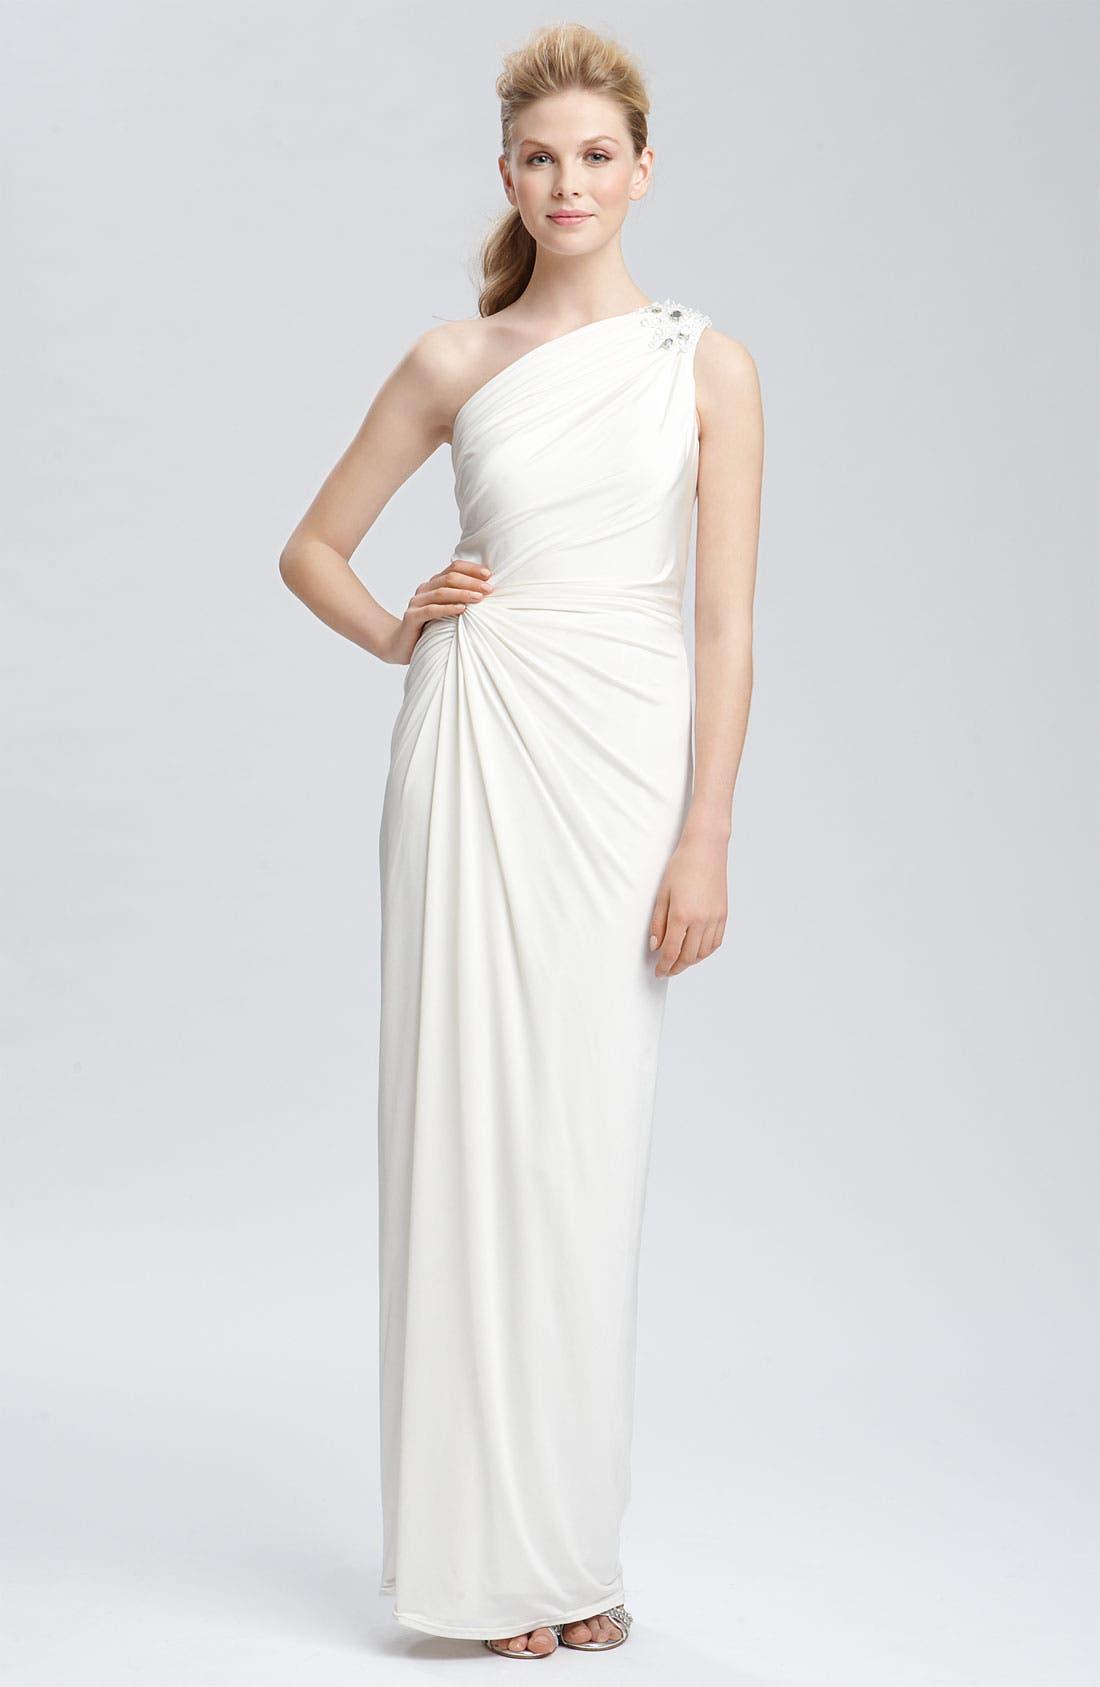 TADASHI SHOJI, Beaded Jersey One Shoulder Gown, Main thumbnail 1, color, 900